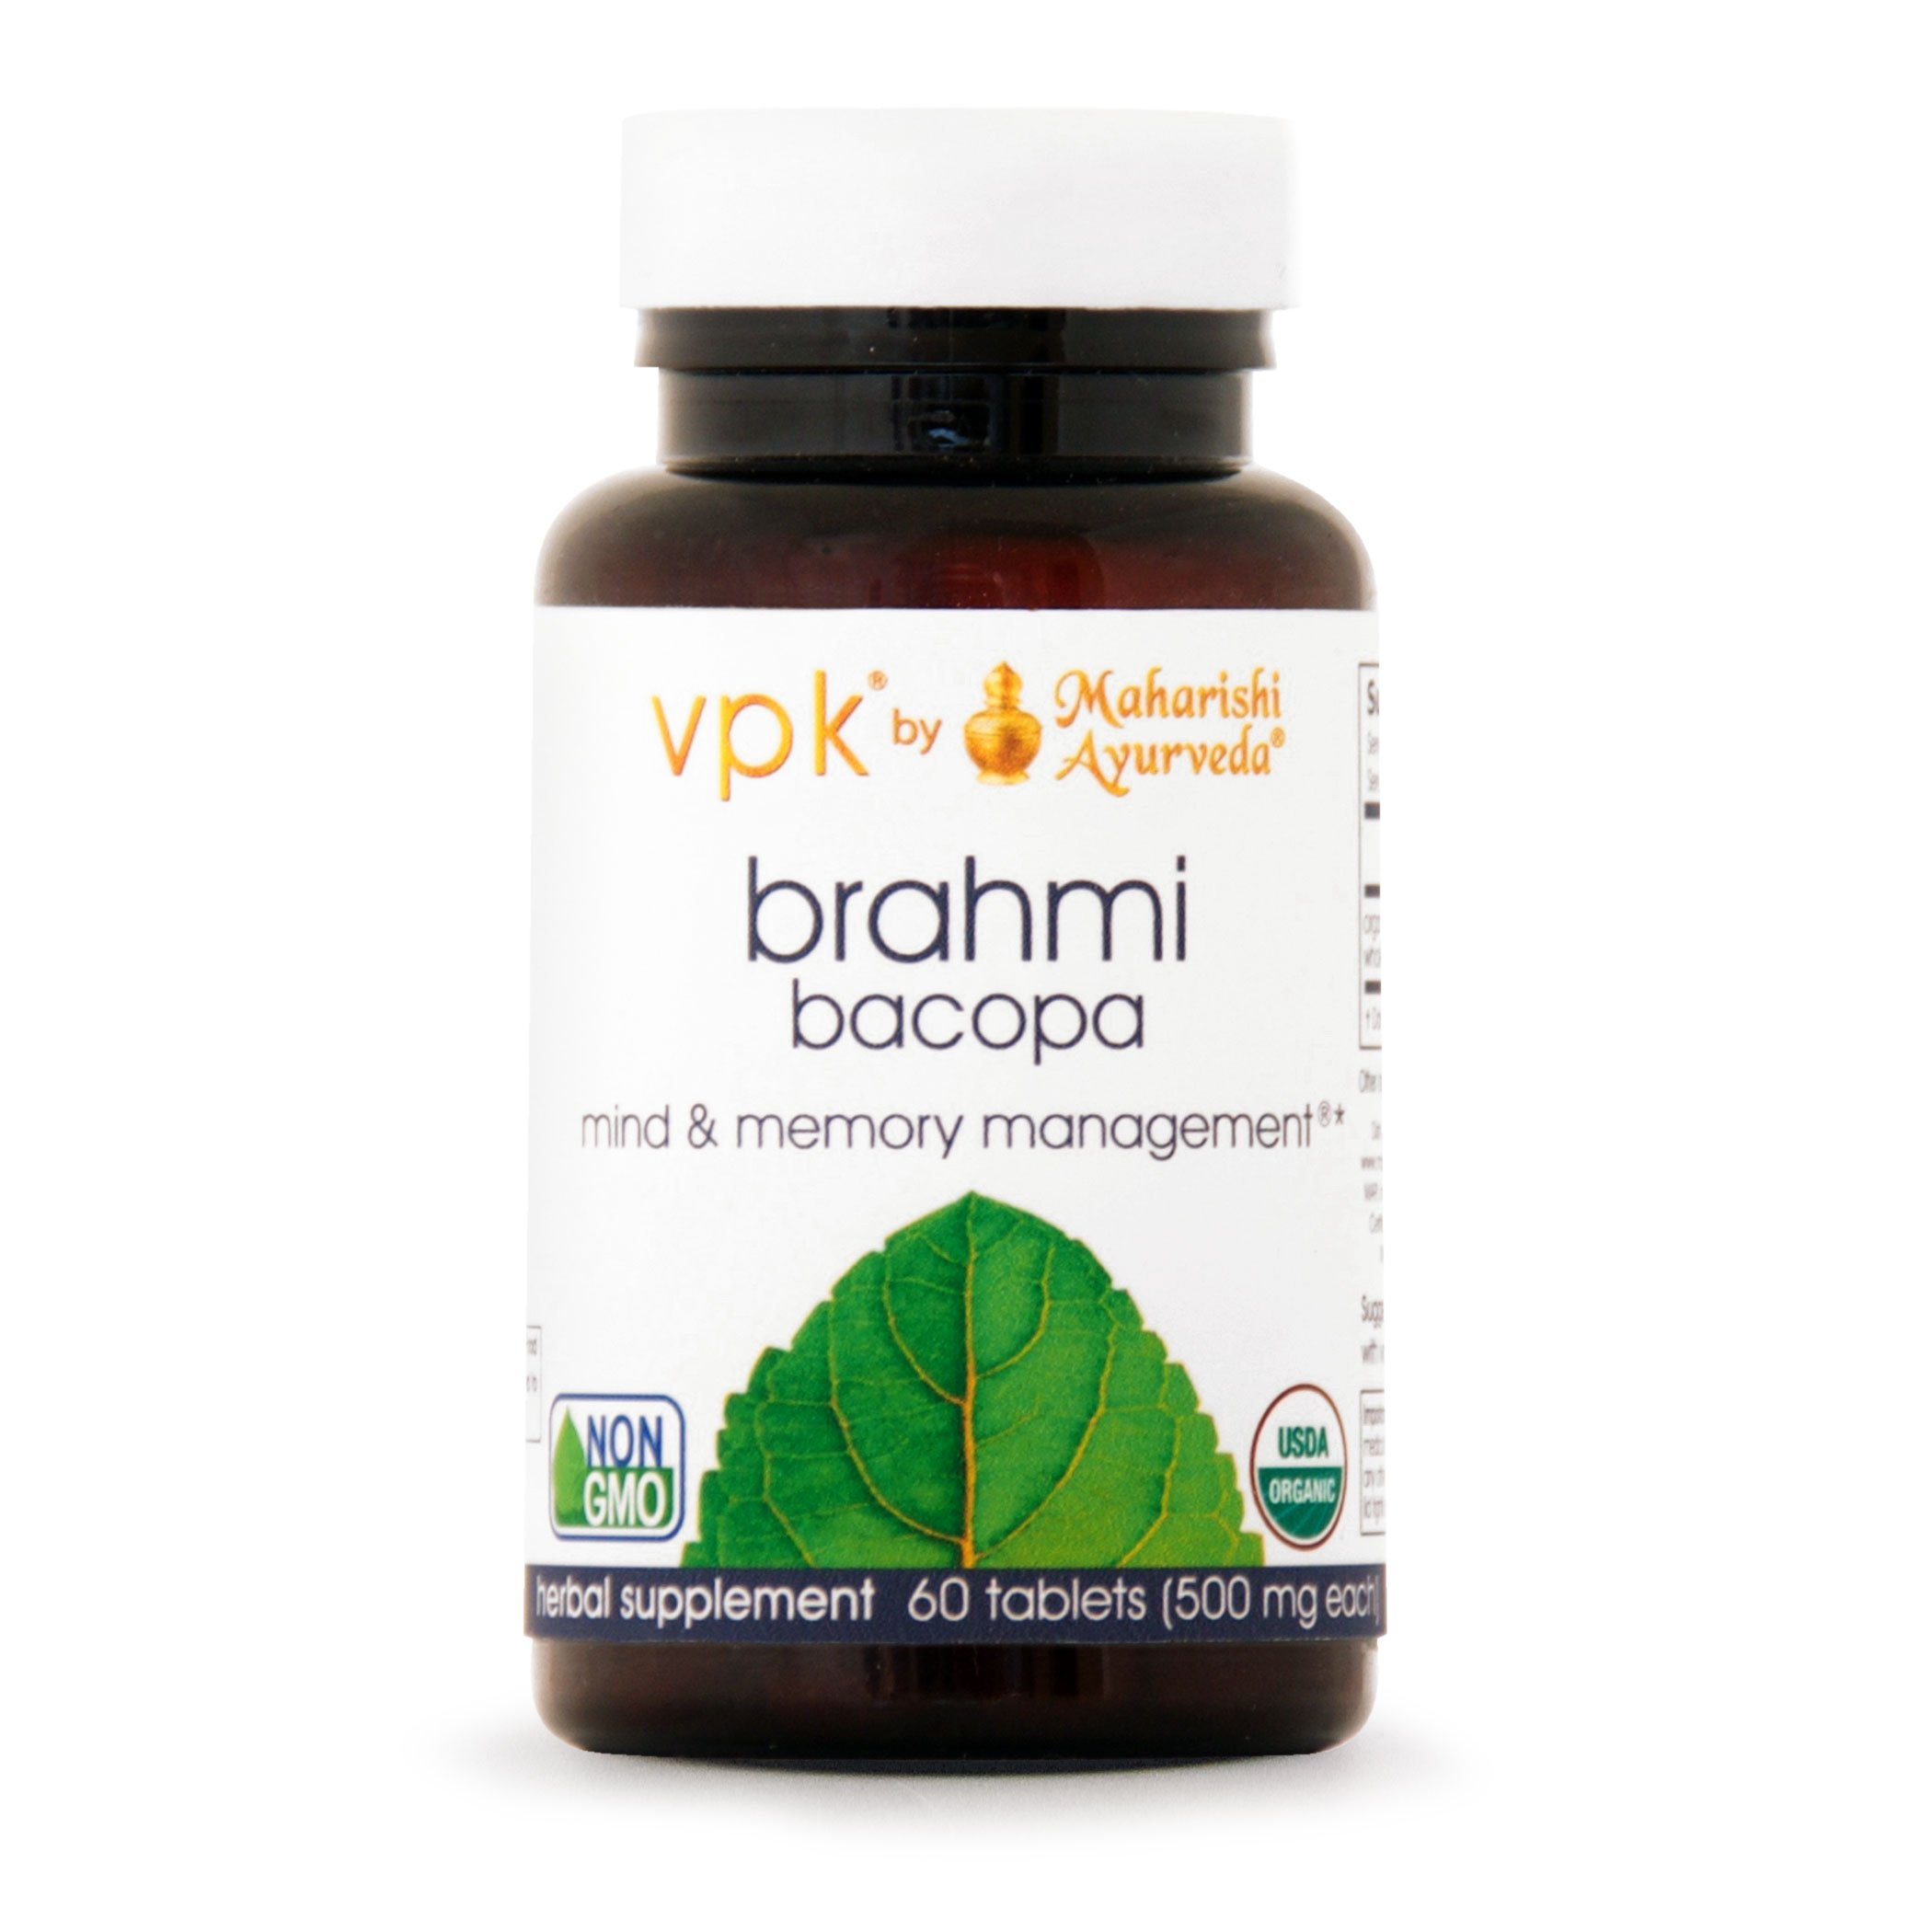 Organic Brahmi | 60 Herbal Tablets - 500 mg ea. | Natural Brain Tonic for Mental Clarity & Optimal Mental Functioning by Maharishi Ayurveda